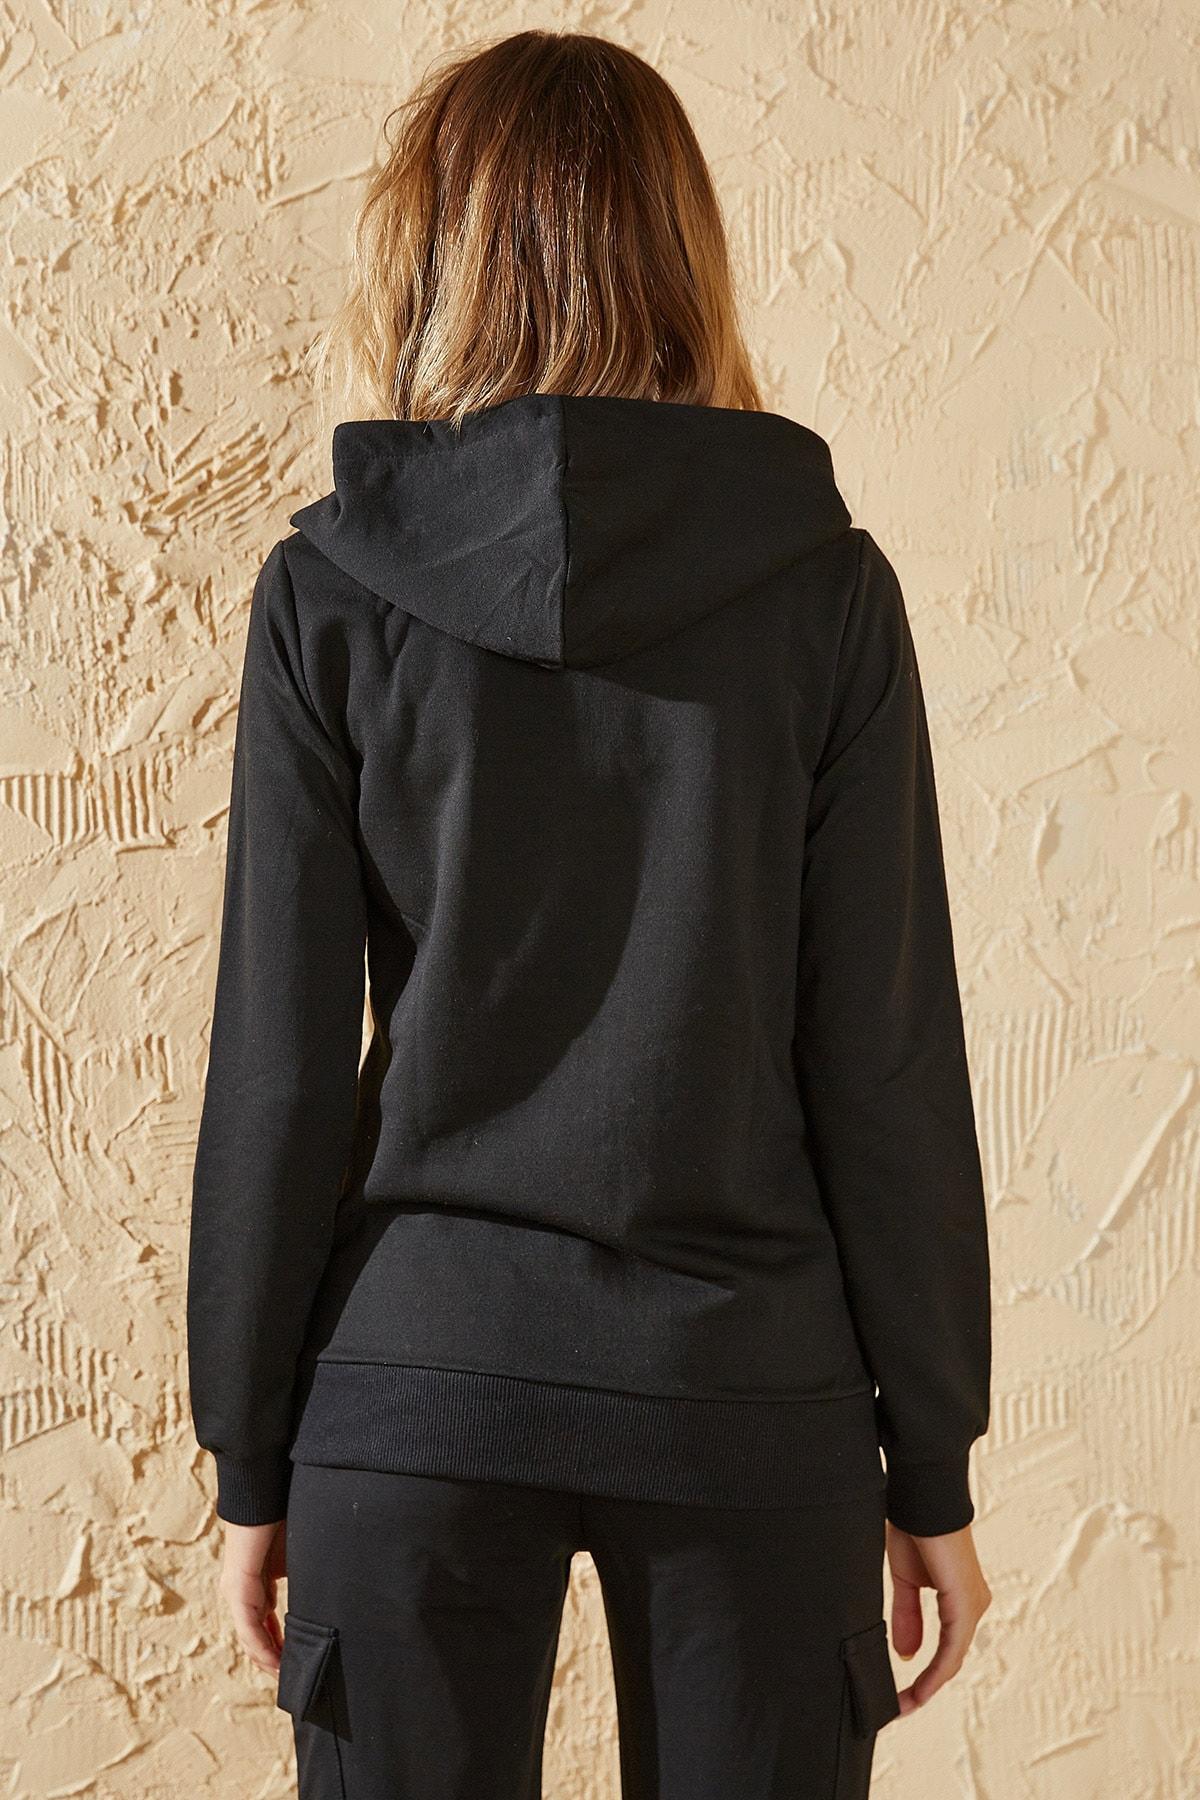 HeraModa Kadın Siyah Fermuarlı Kapüşonlu Sweatshirt 2